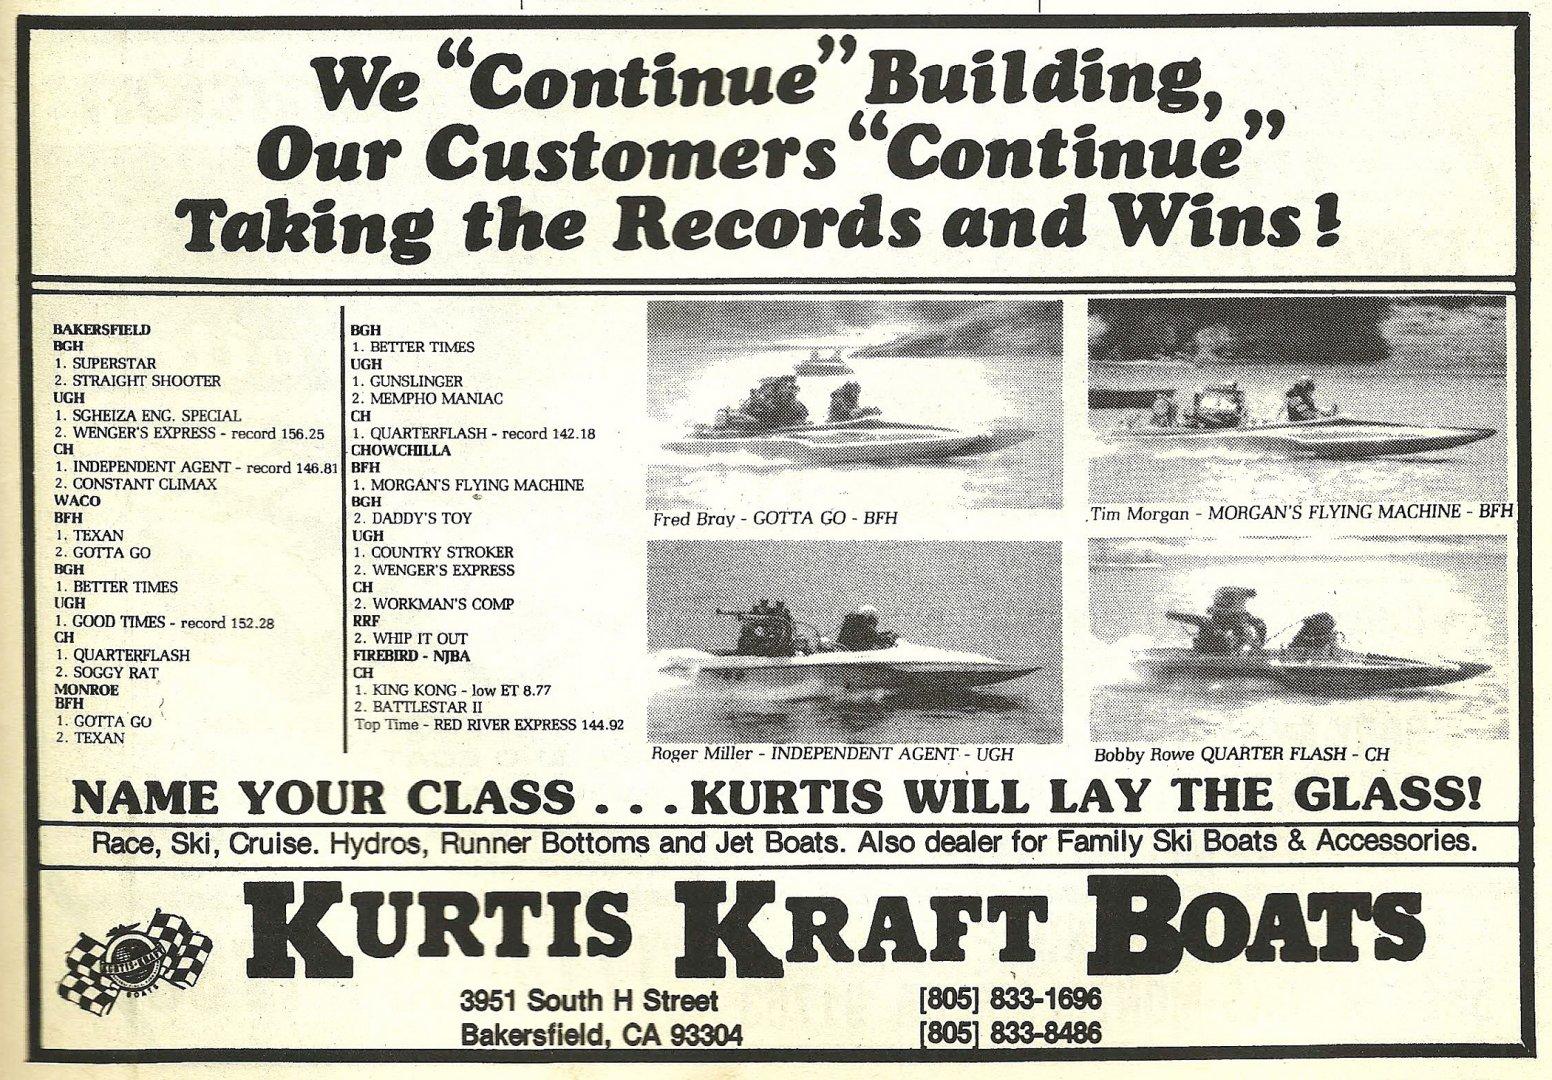 Kurtis Kraft Boats B.jpg